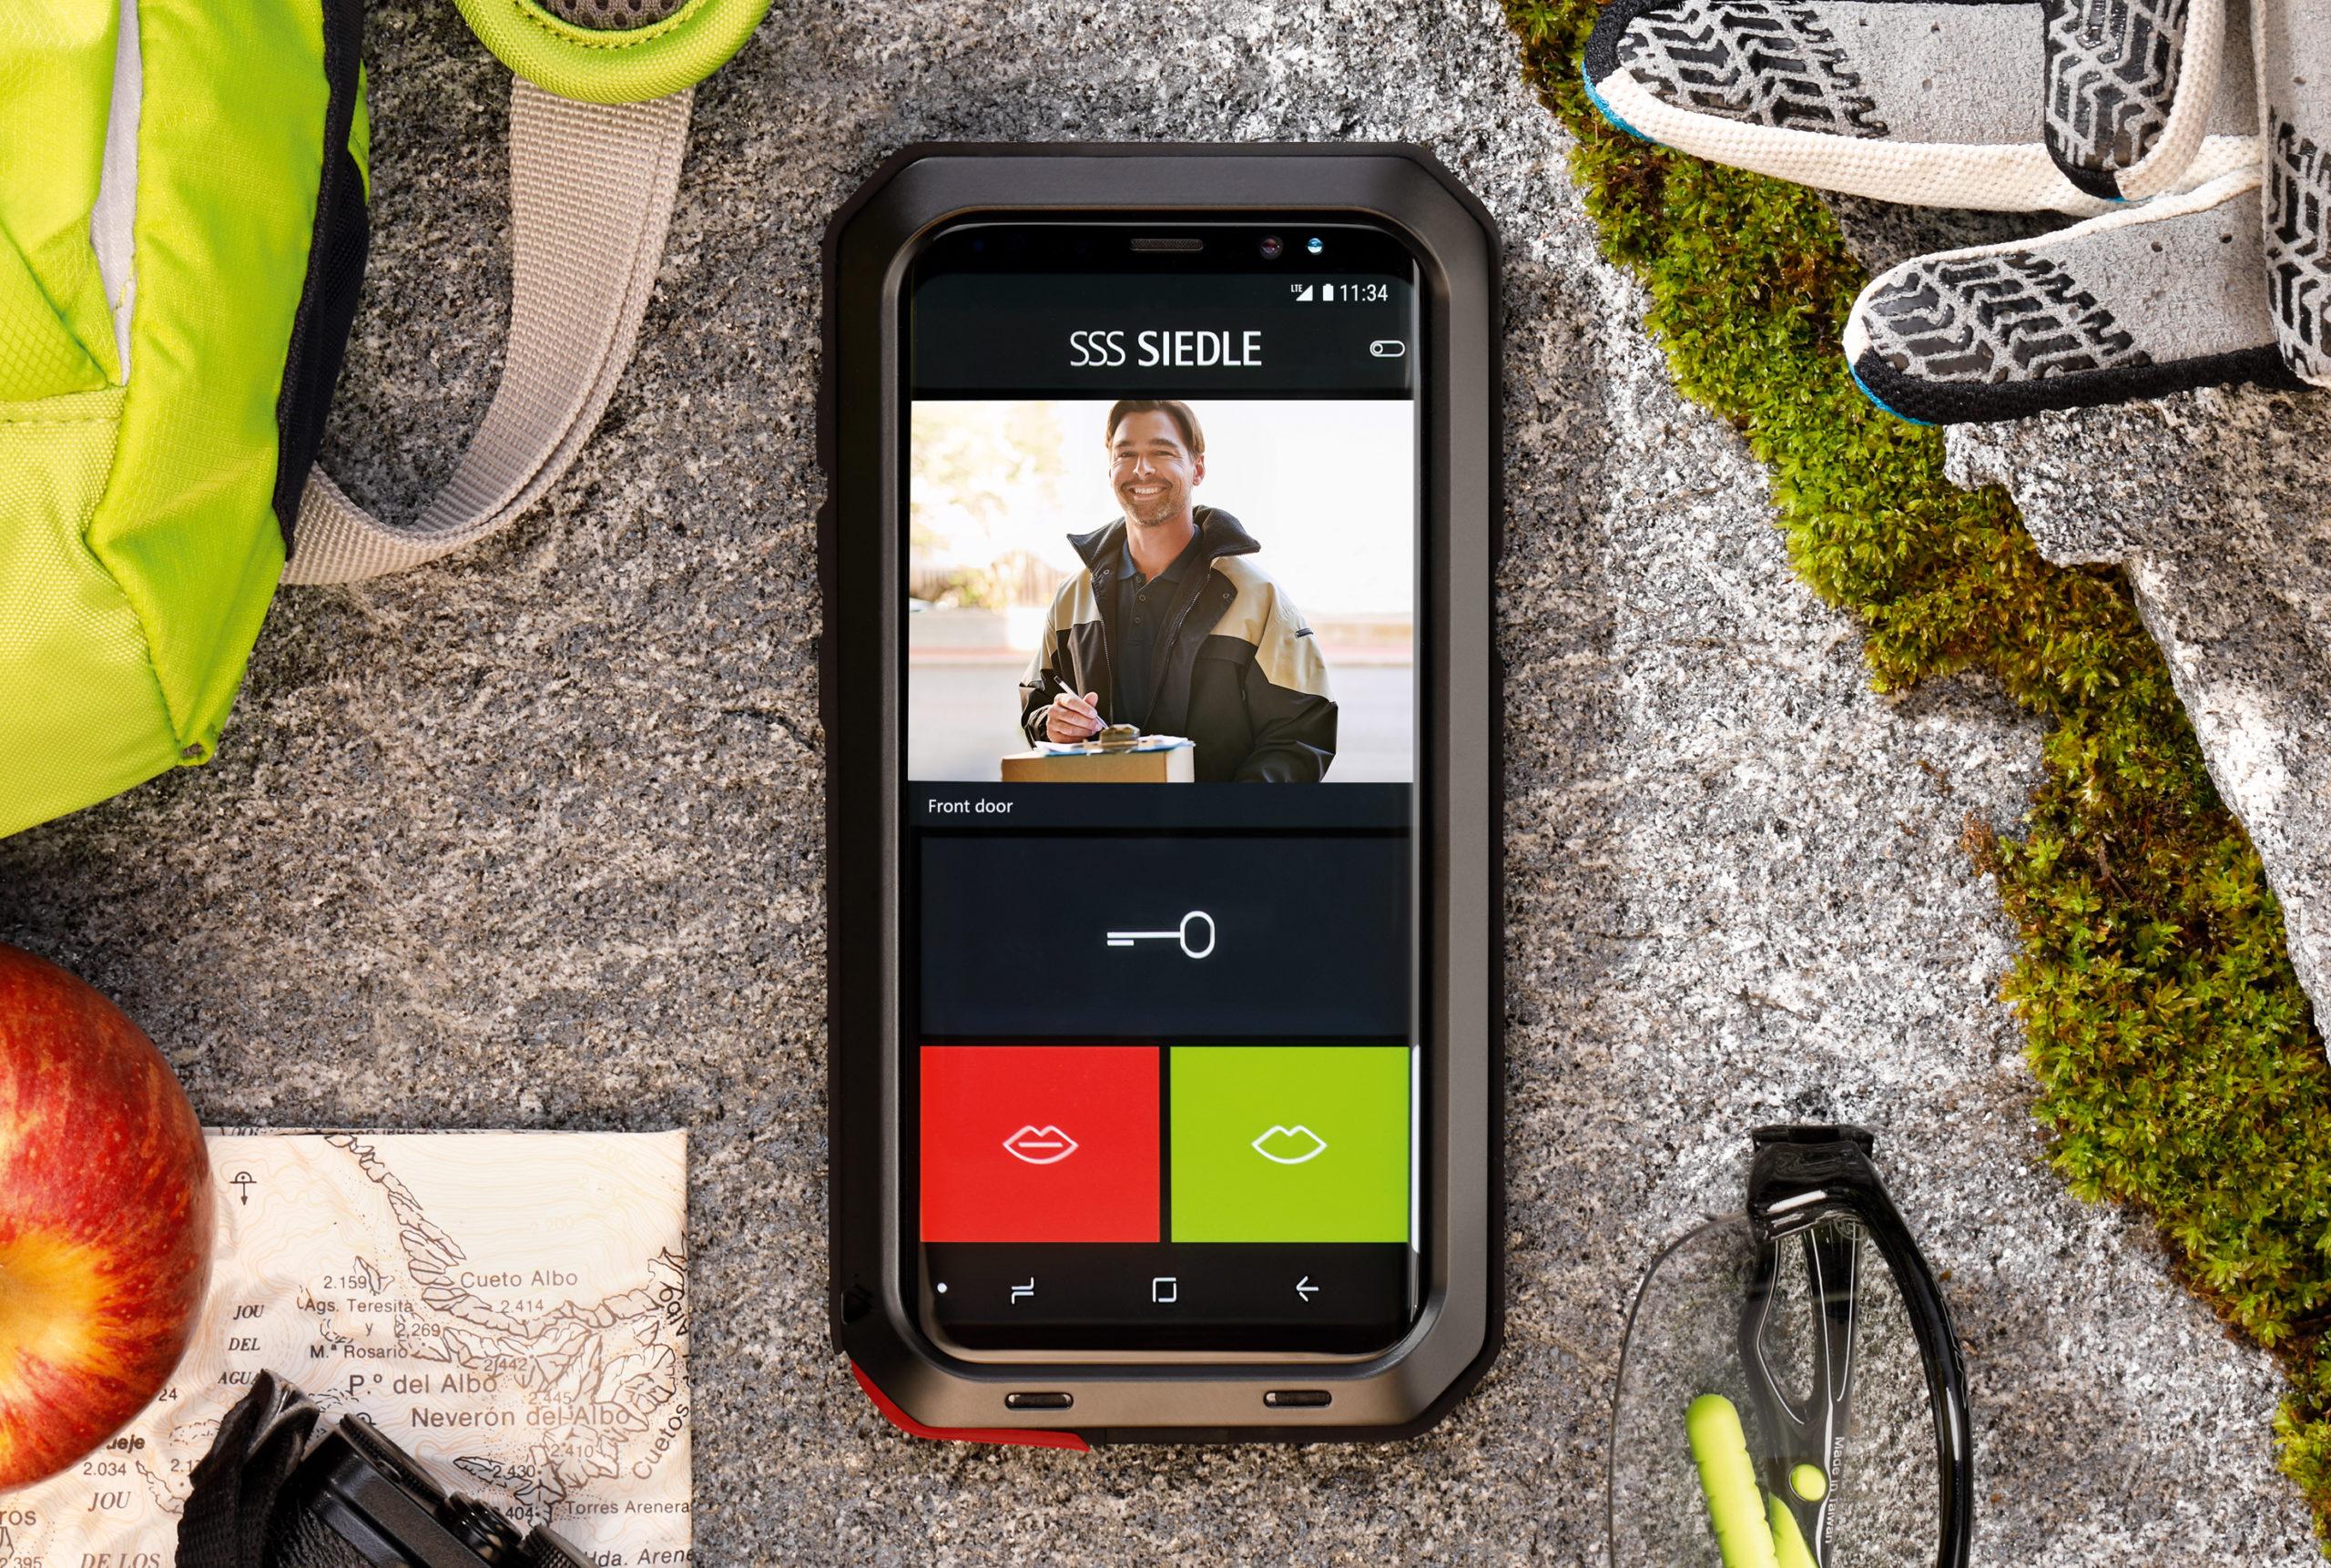 Smartphone als Türöffner